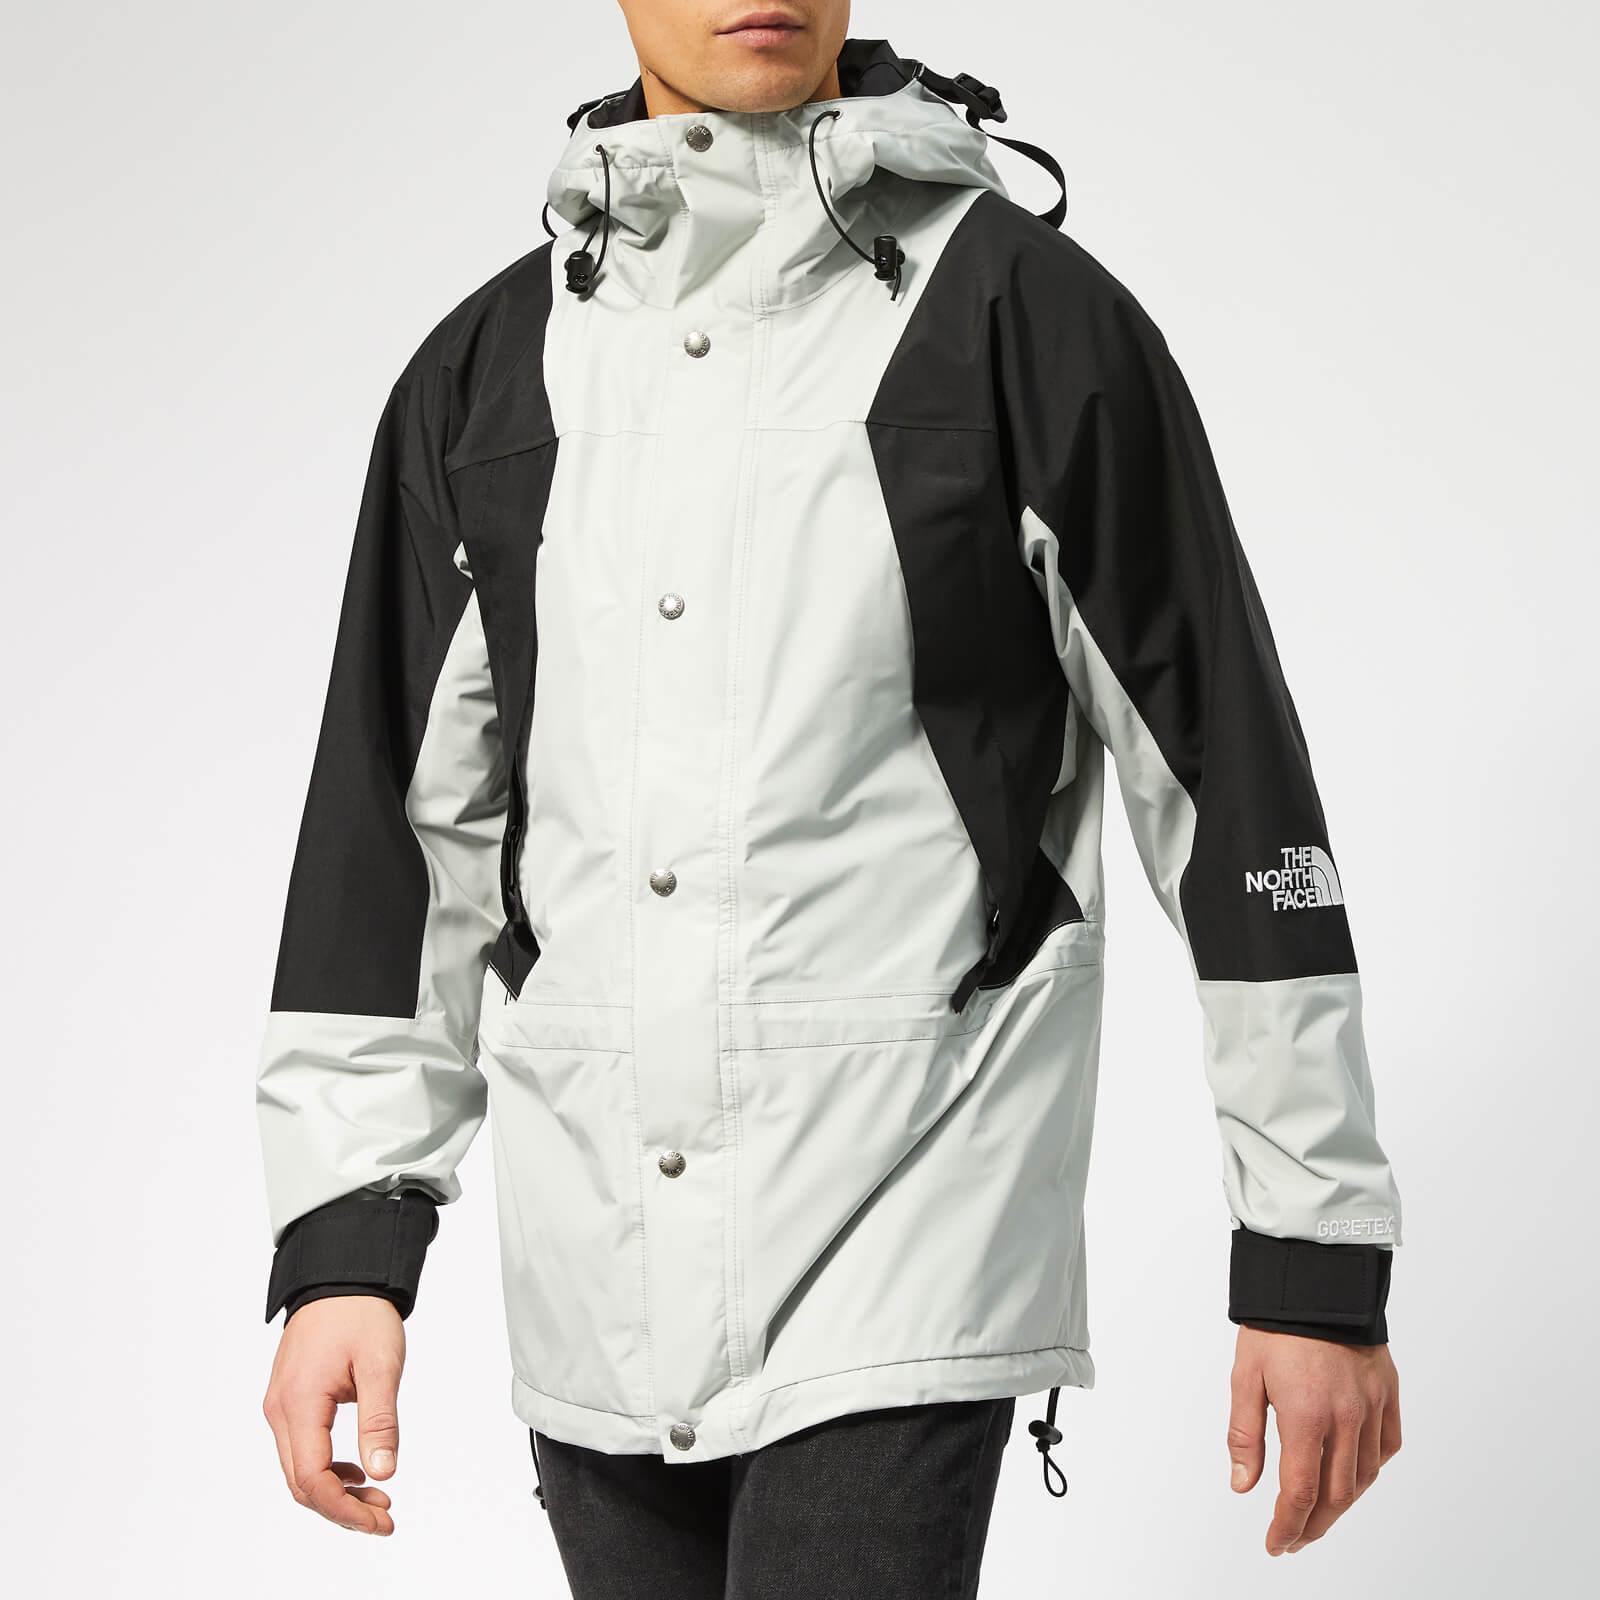 6c94afceb The North Face Men's 1994 Retro Mountain Light Goretex Jacket - High Rise  Grey